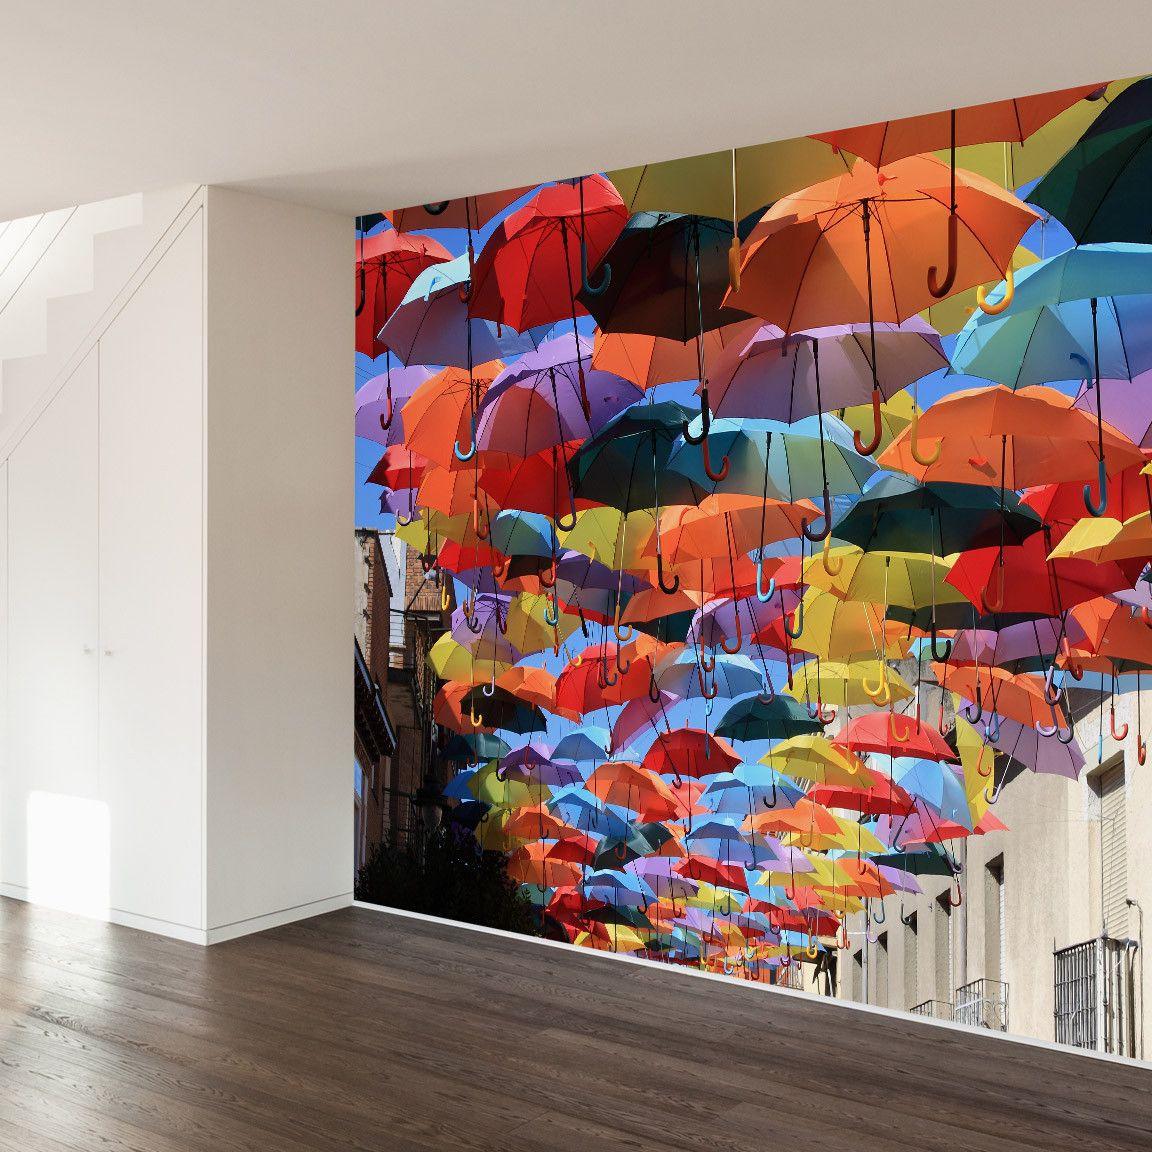 Umbrellas in madrid wall mural decal walls need love murals